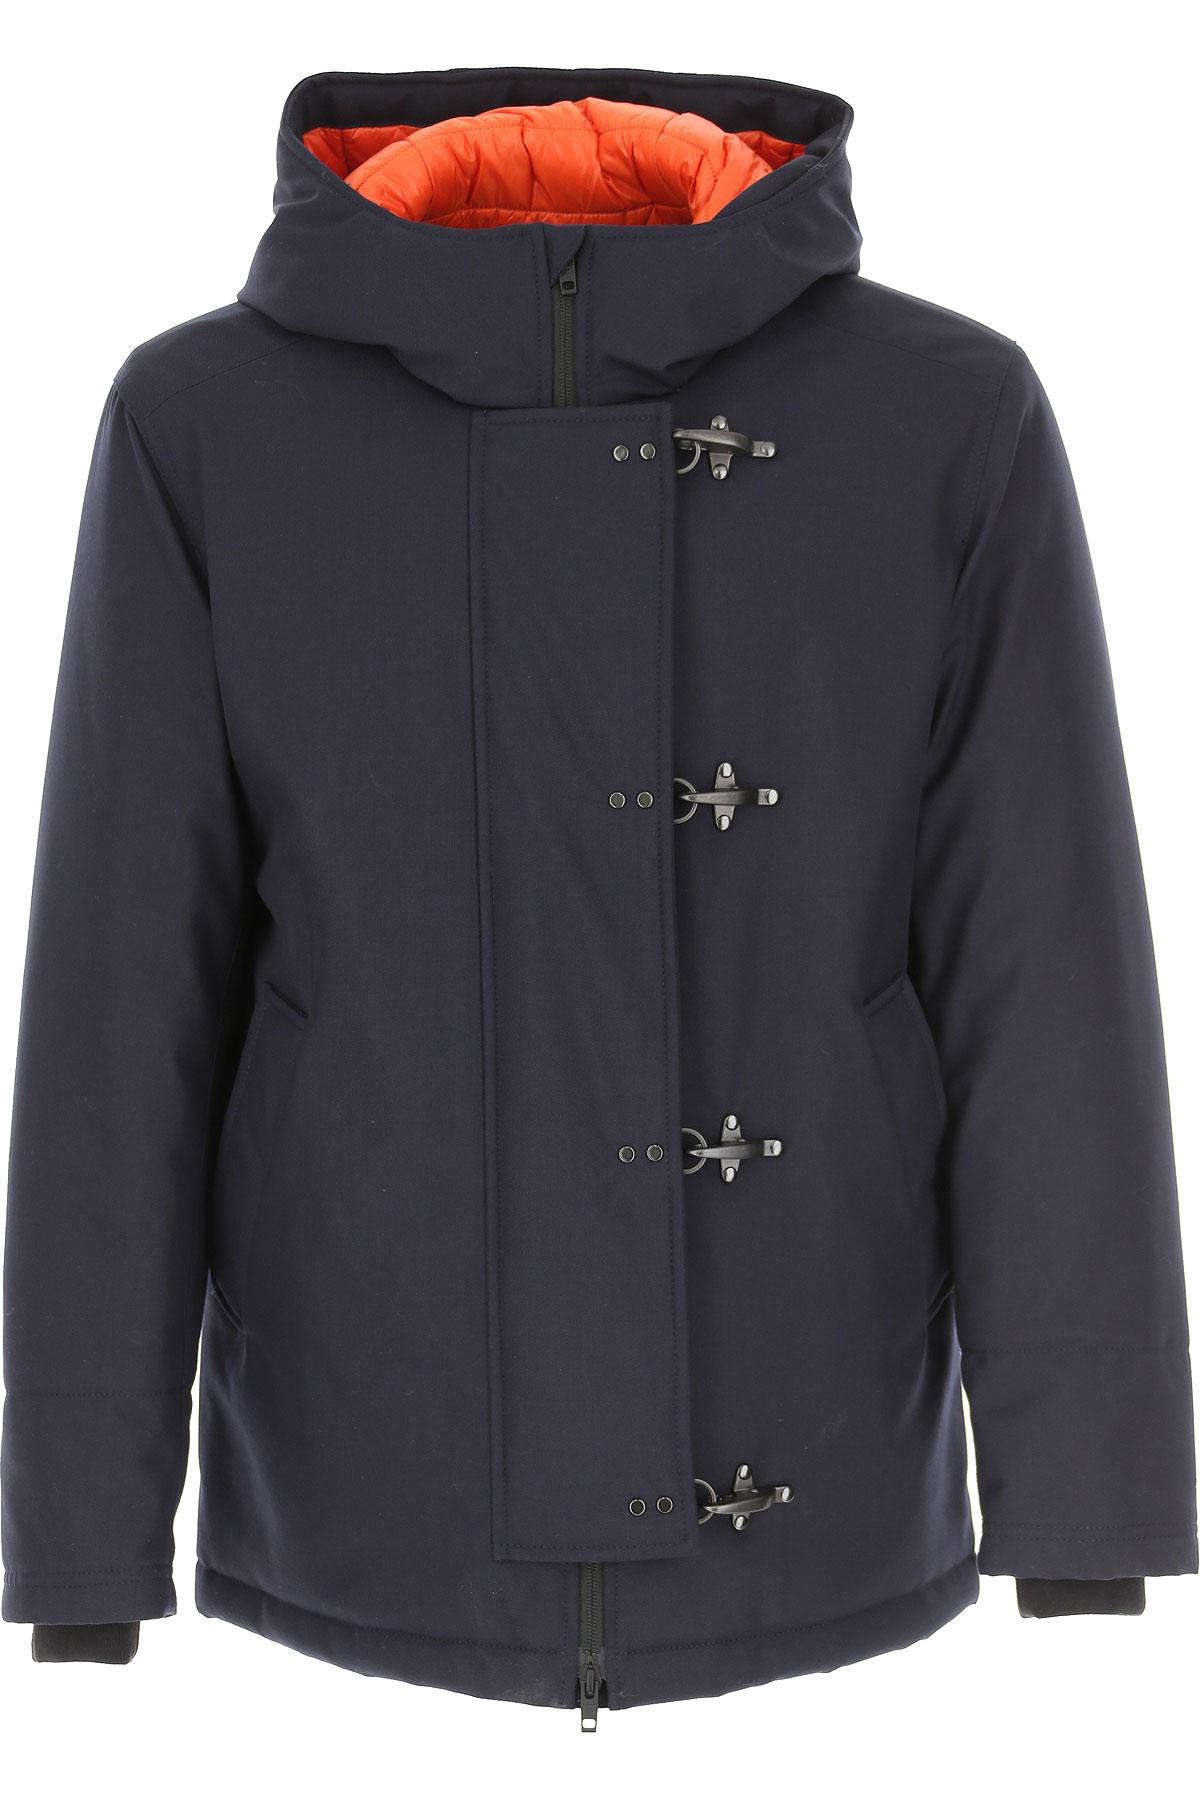 Fay Down Jacket for Men, Puffer Ski Jacket On Sale, Dark Blue, Down, 2019, L M S XL